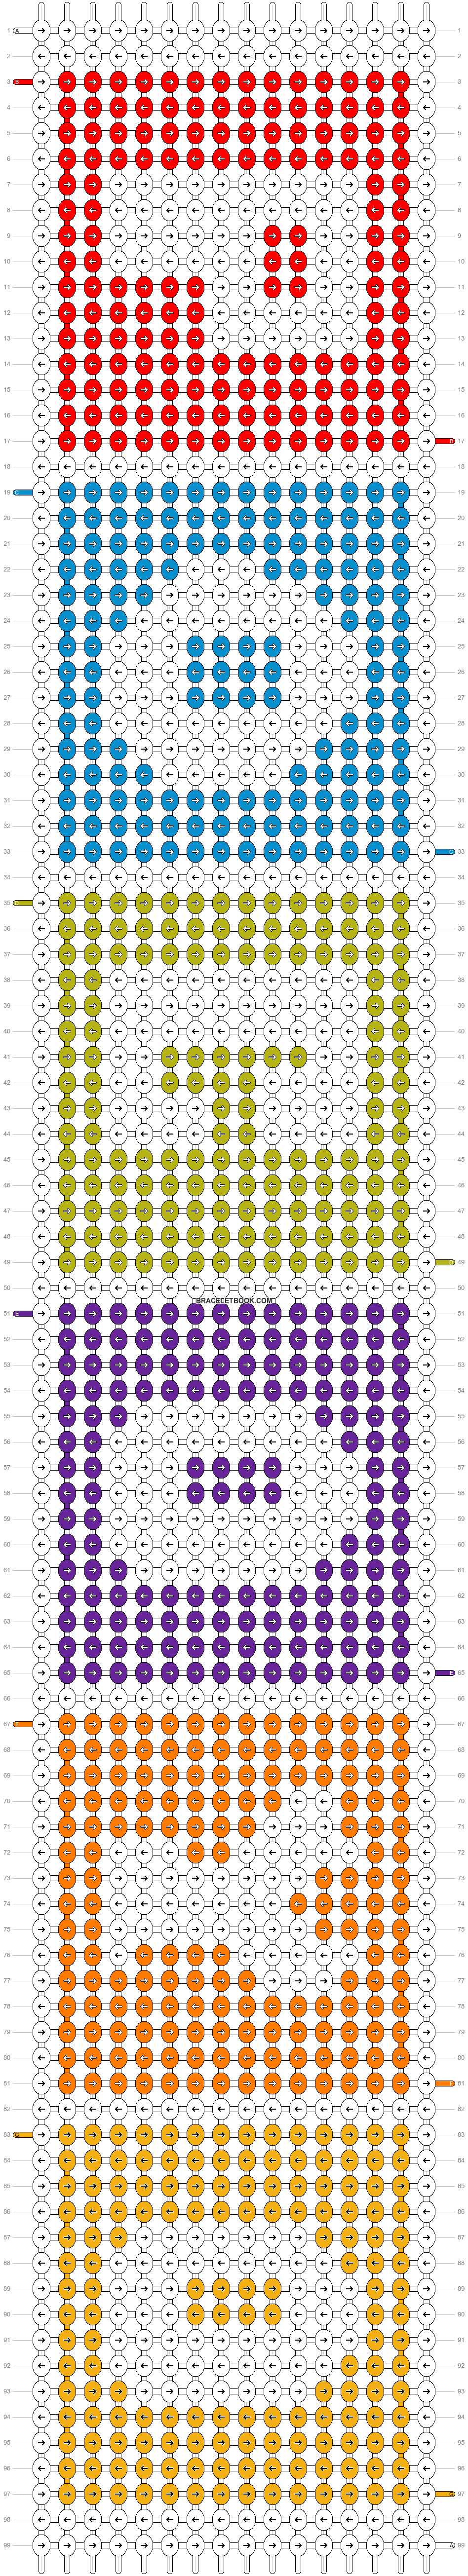 Alpha pattern #12548 pattern